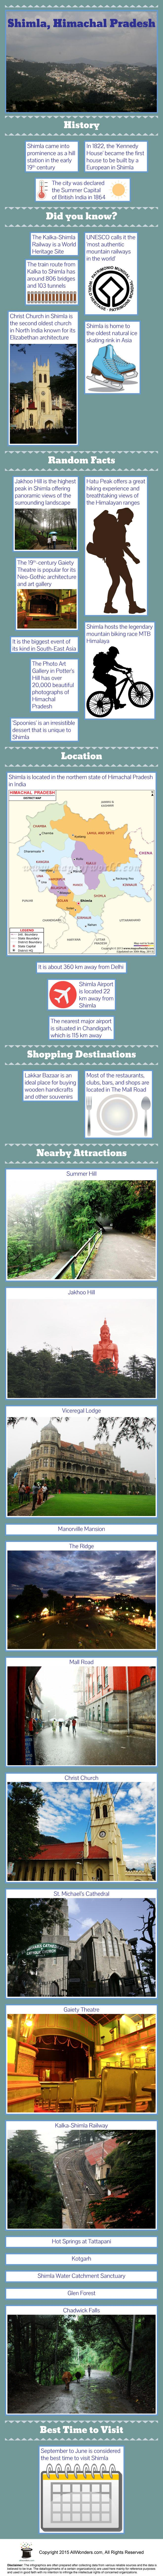 Shimla Infographic